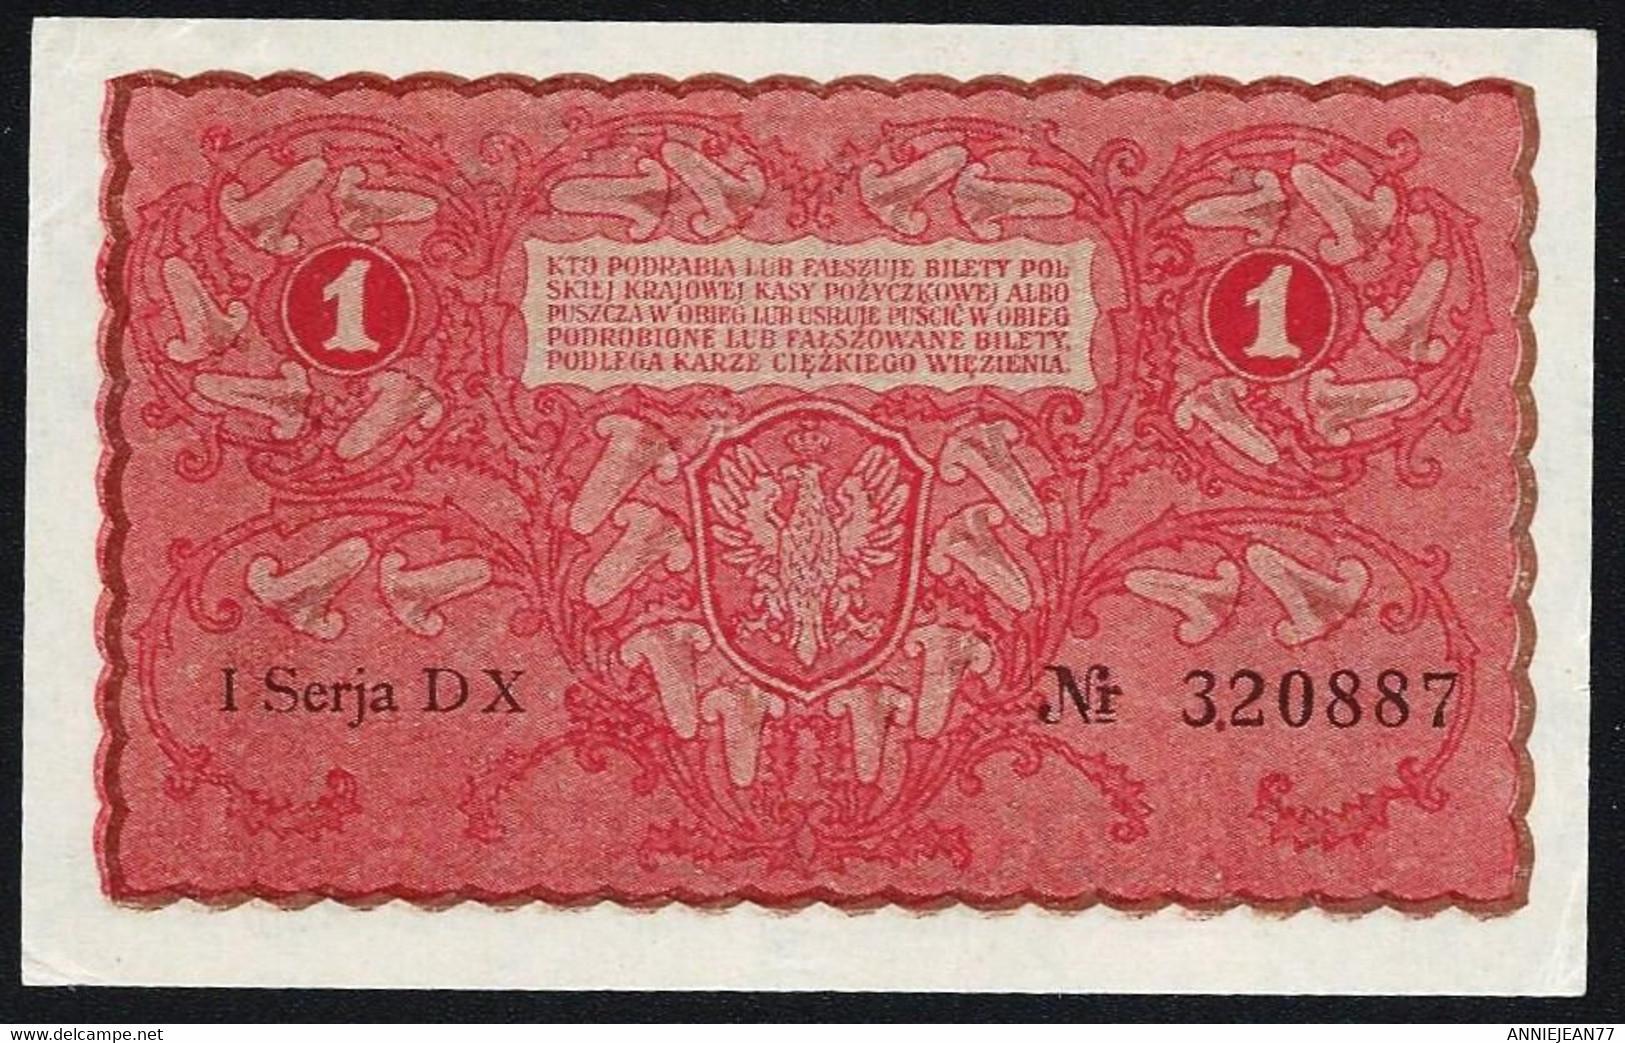 POLOGNE - 1 MARKA 1919 - UNC - Polen